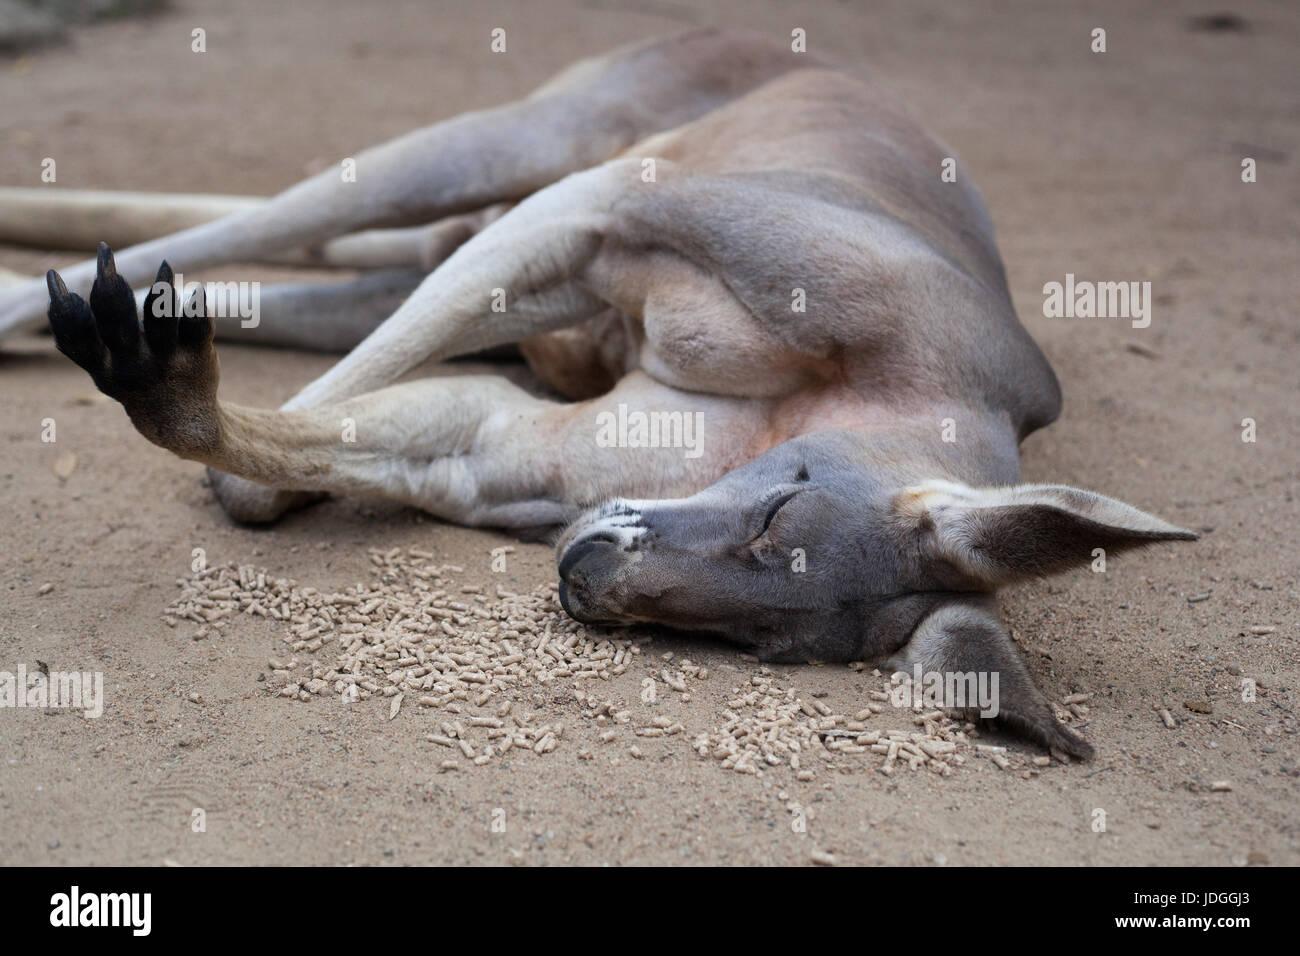 Red kangaroo sleeping on a pile of food in Currumbin Wildlife Sanctuary, Australia - Stock Image